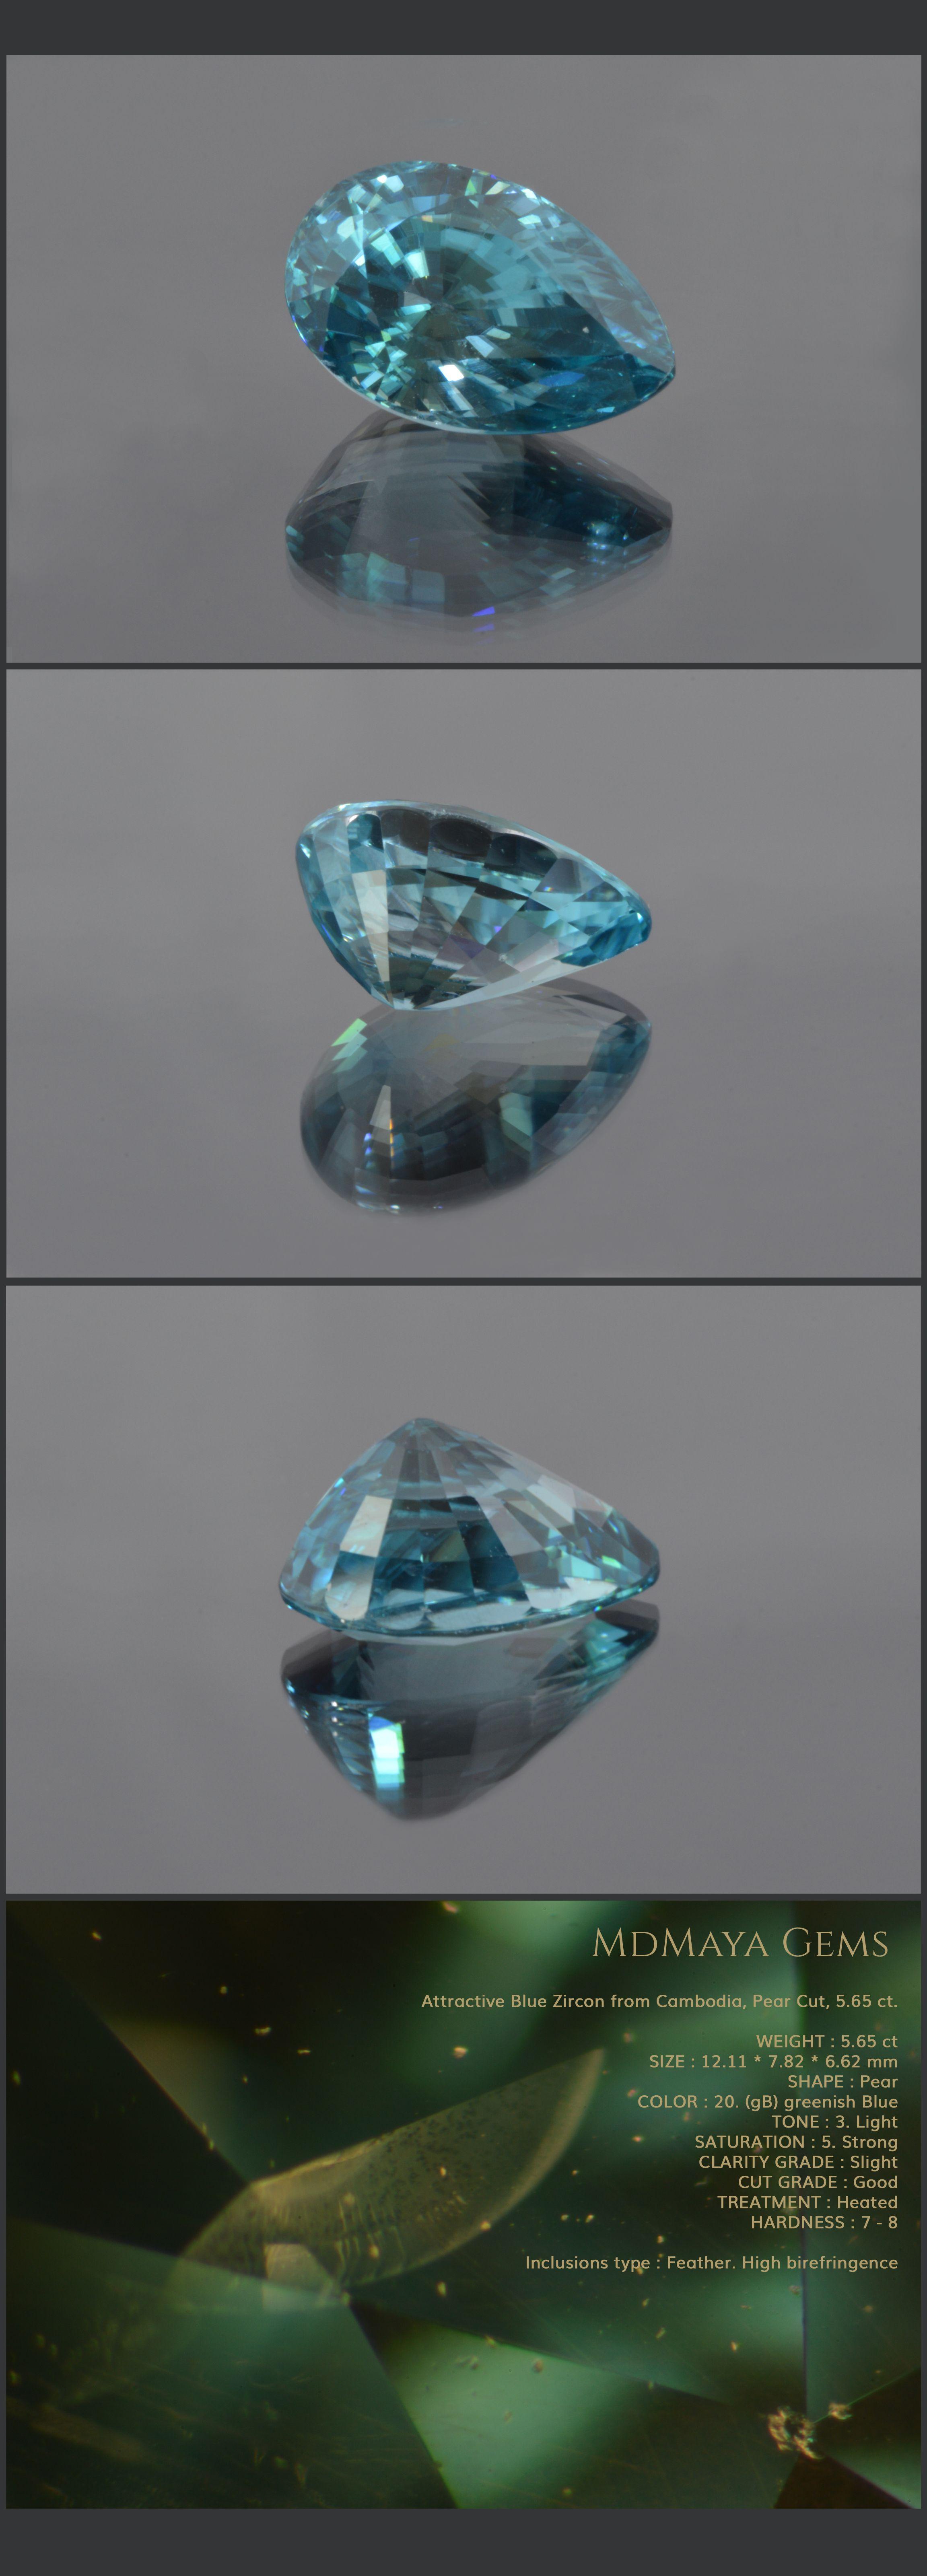 Attractive Blue Zircon from Cambodia, Pear Cut, 5.65 ct. Loose Zircon Gemstone MdMaya Gems